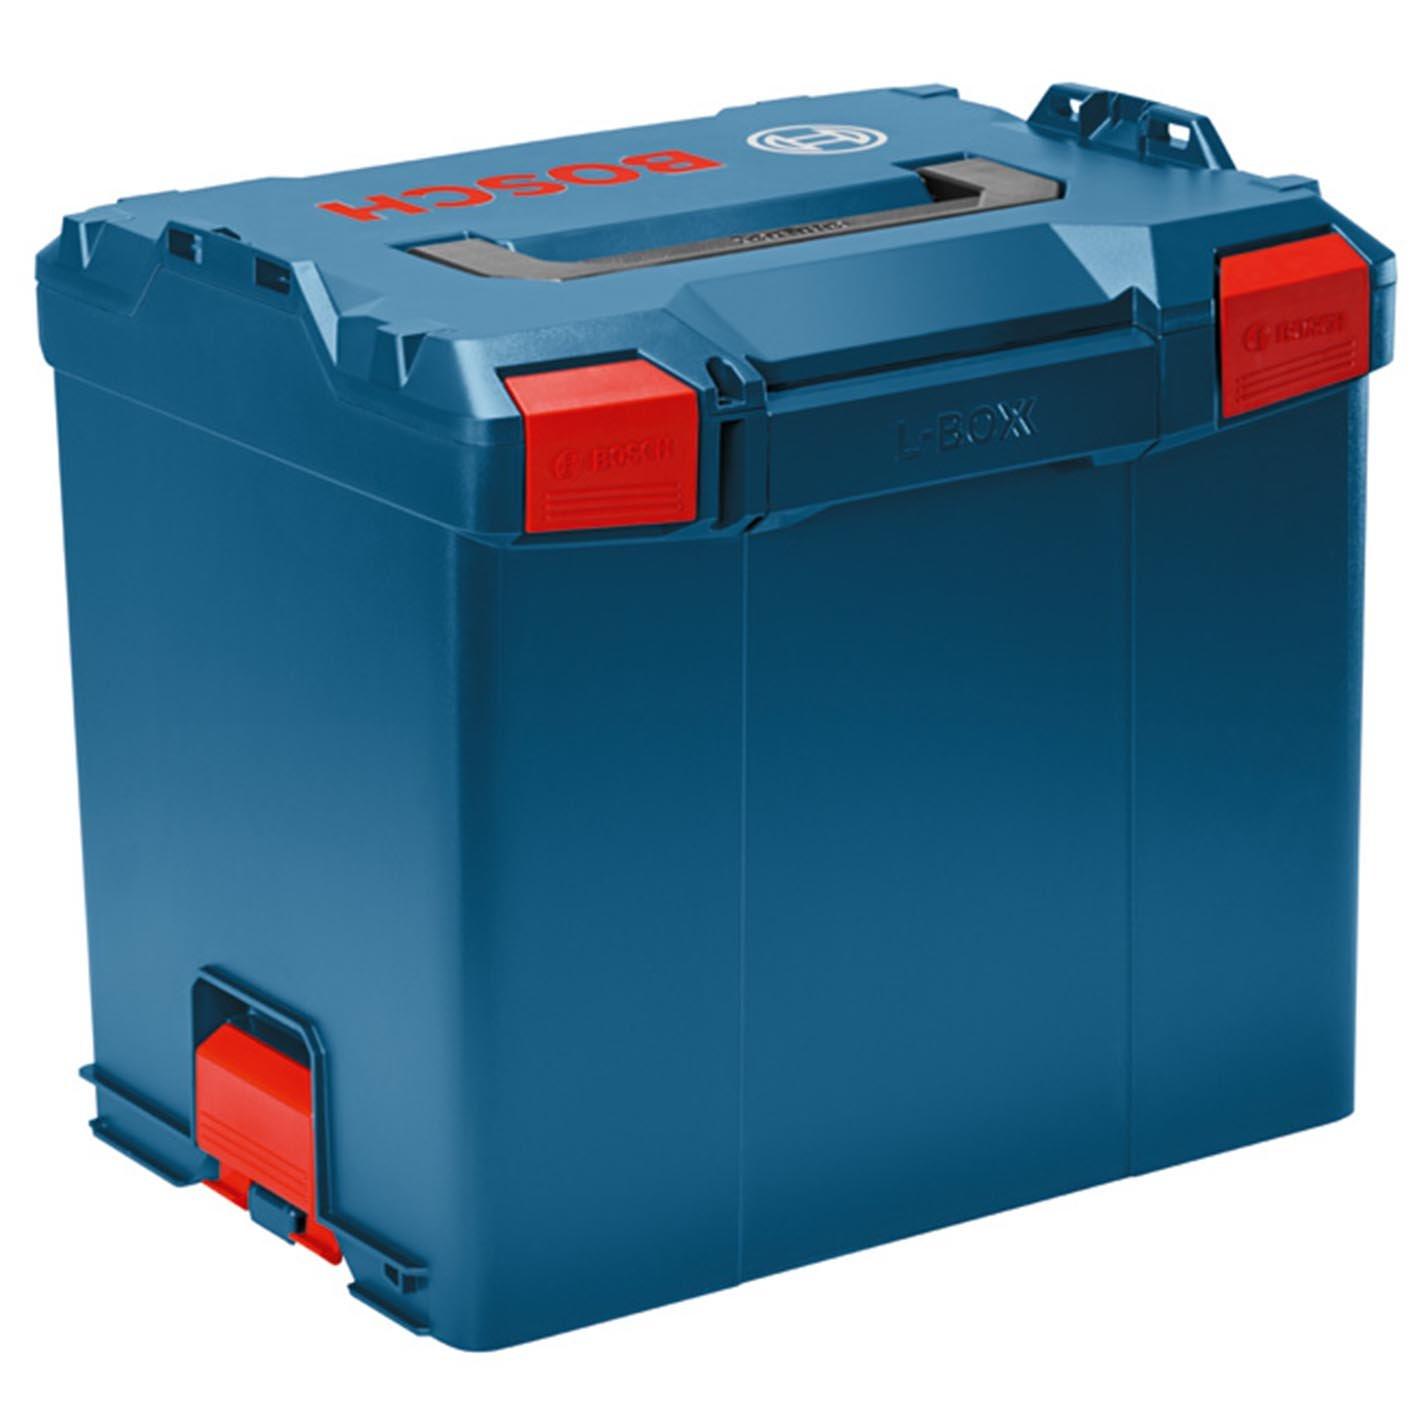 Bosch Professional Koffersystem L-BOXX 102 (Ladevolumen: 9,9 Liter, max. Belastung: 25 kg, Gewicht: 1,8 kg, Material: ABS Plastik, PA6 Kunststoff) 1600A012FZ